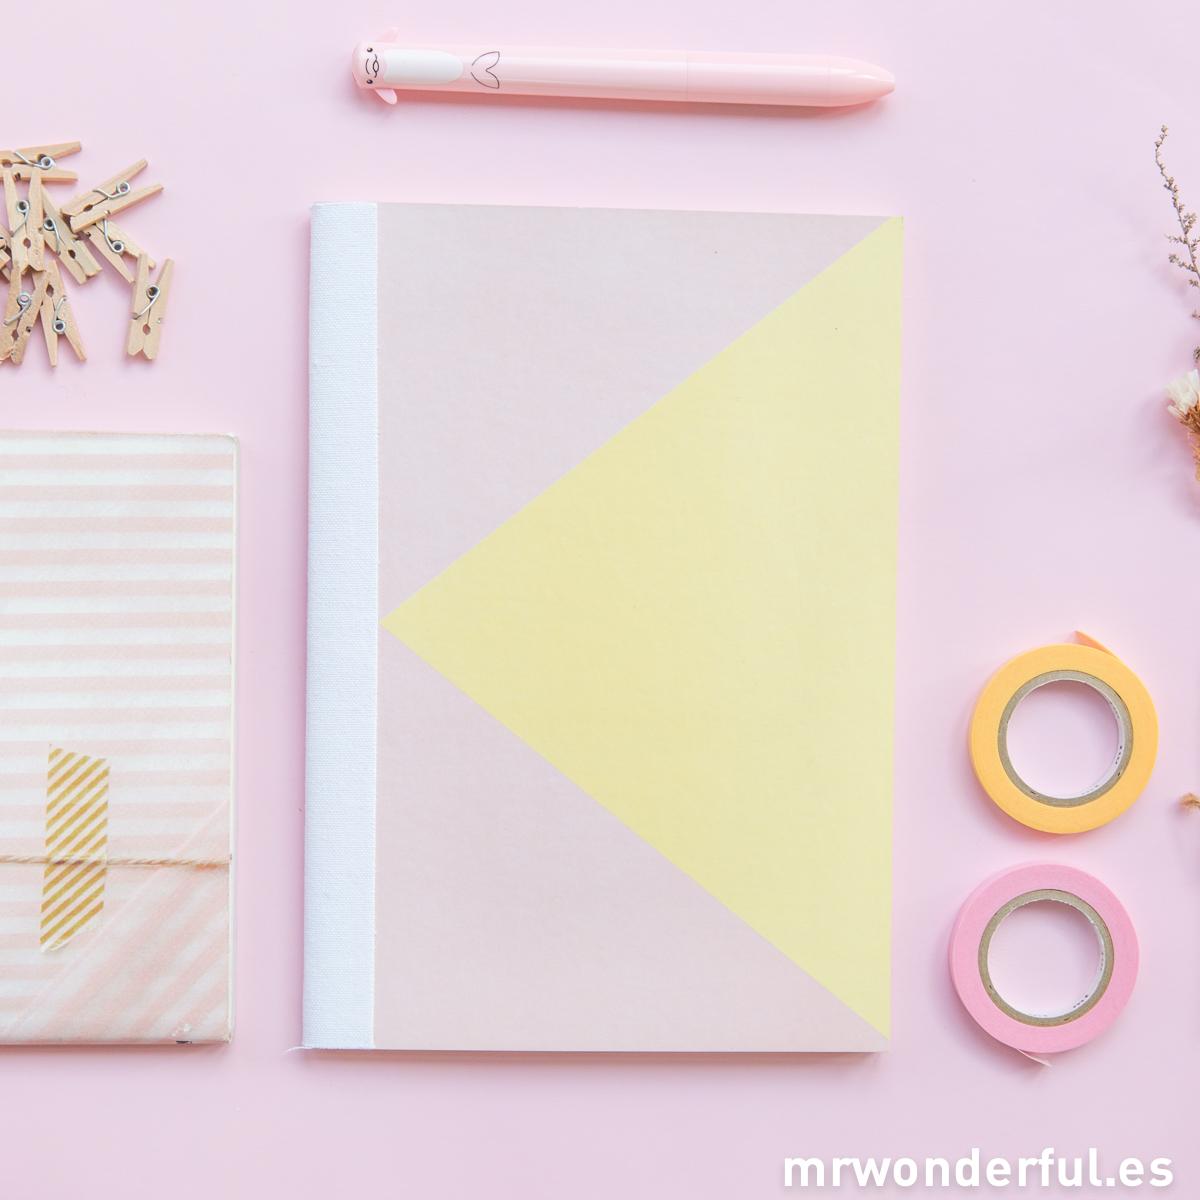 mrwonderful_SK0991_3_Libreta-mediana-rosa-amarillo-2